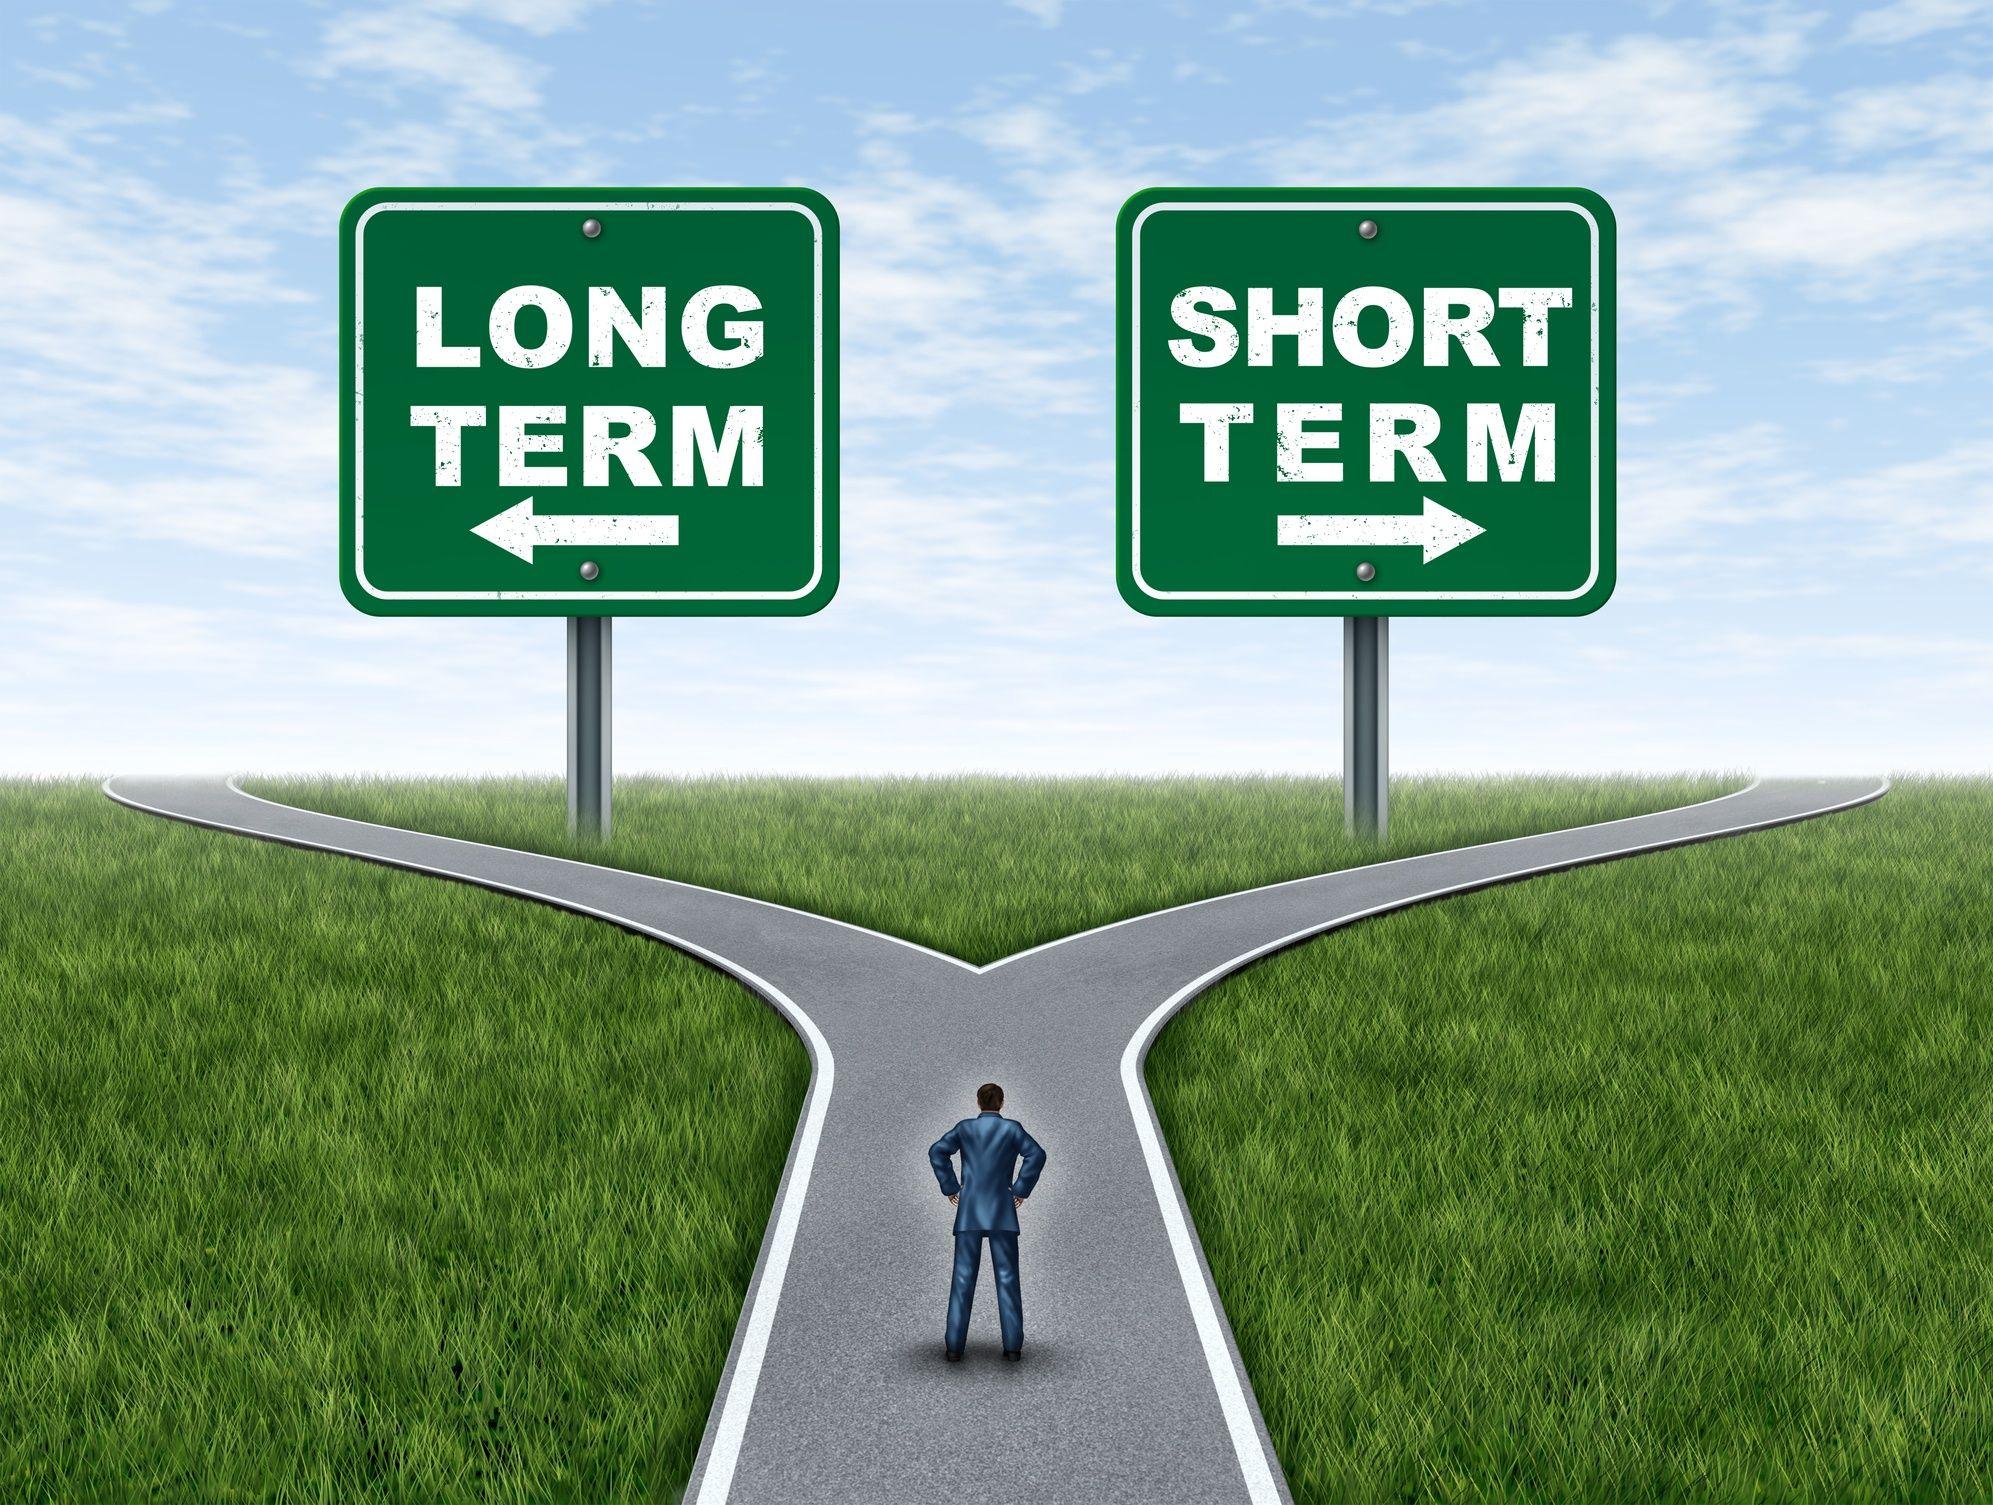 Long term short term path cartoon